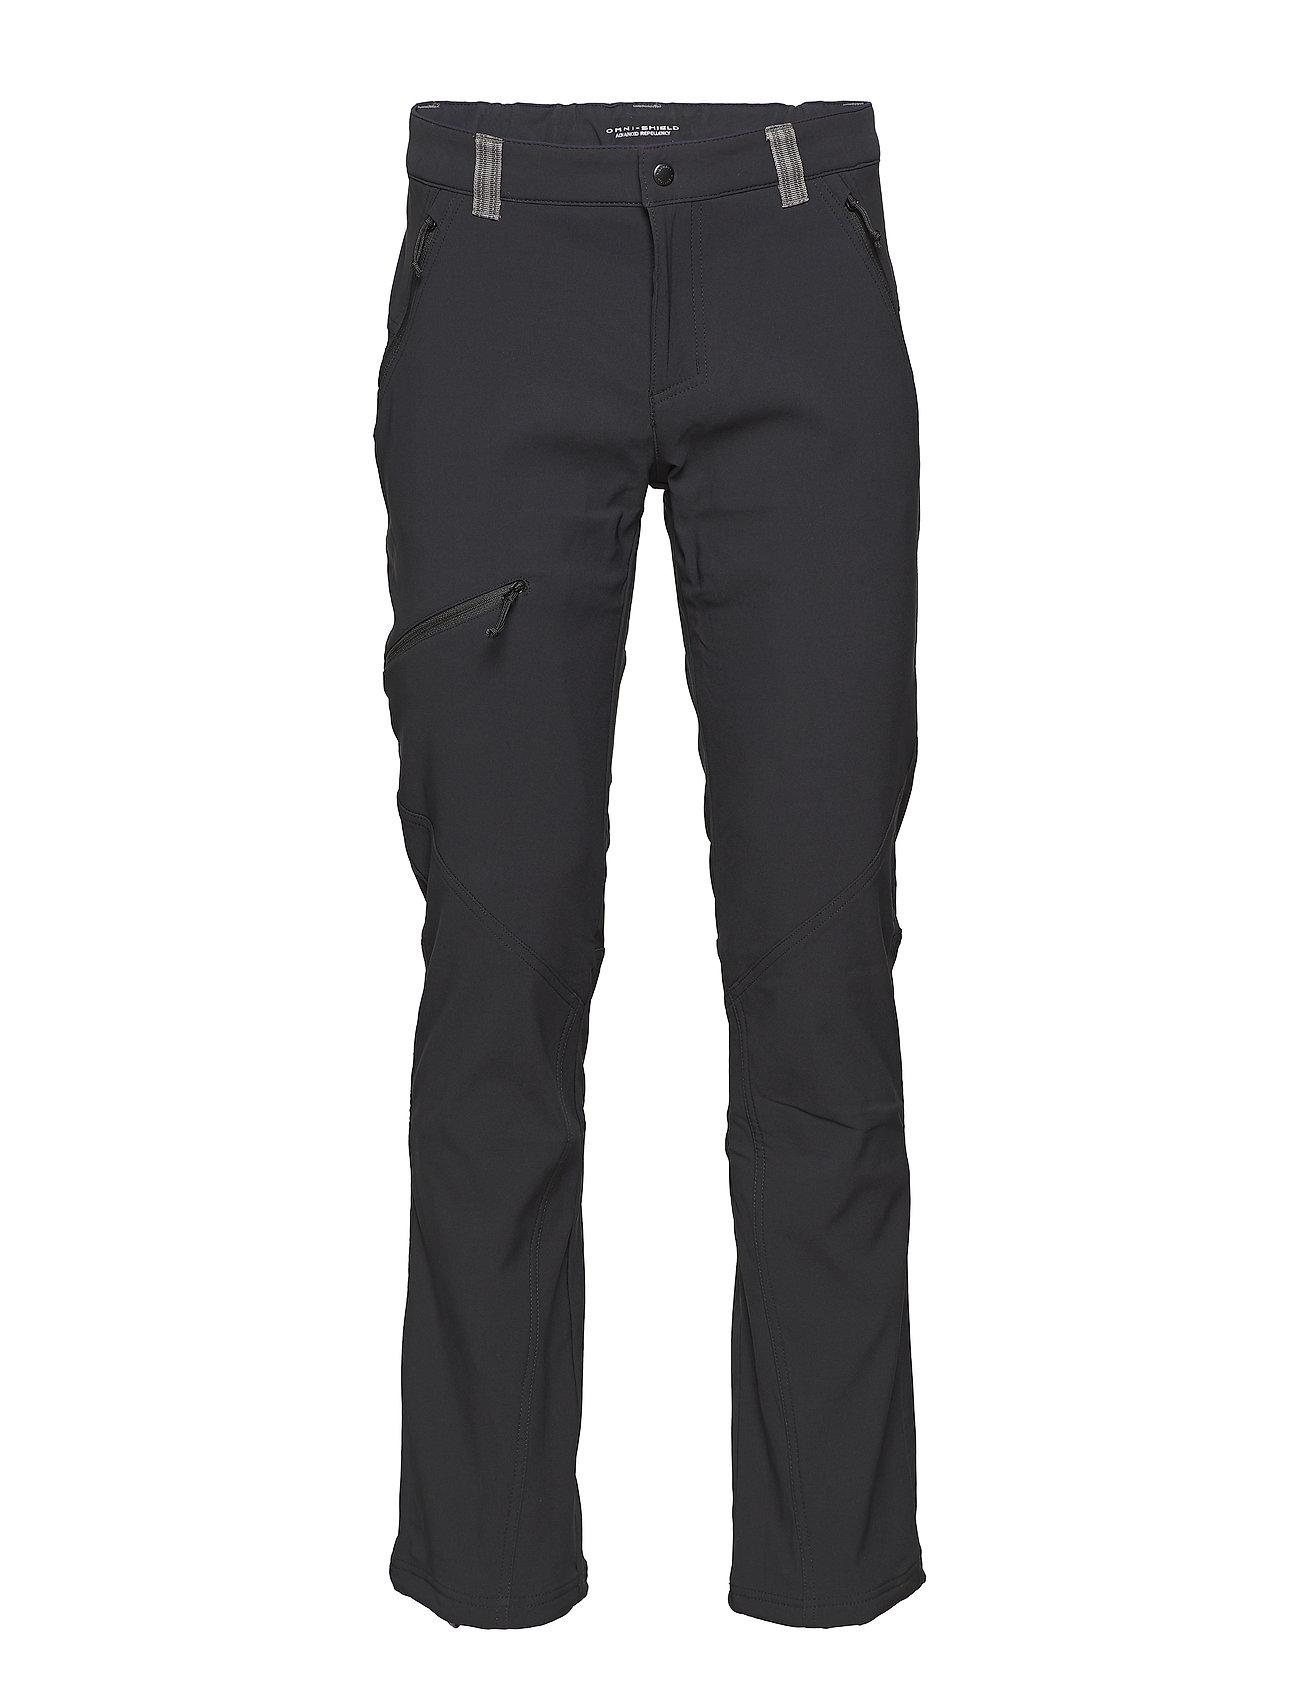 1f5a0d39 Triple Canyon™ Fall Hiking Pant (Black) (521.95 kr) - Columbia ...